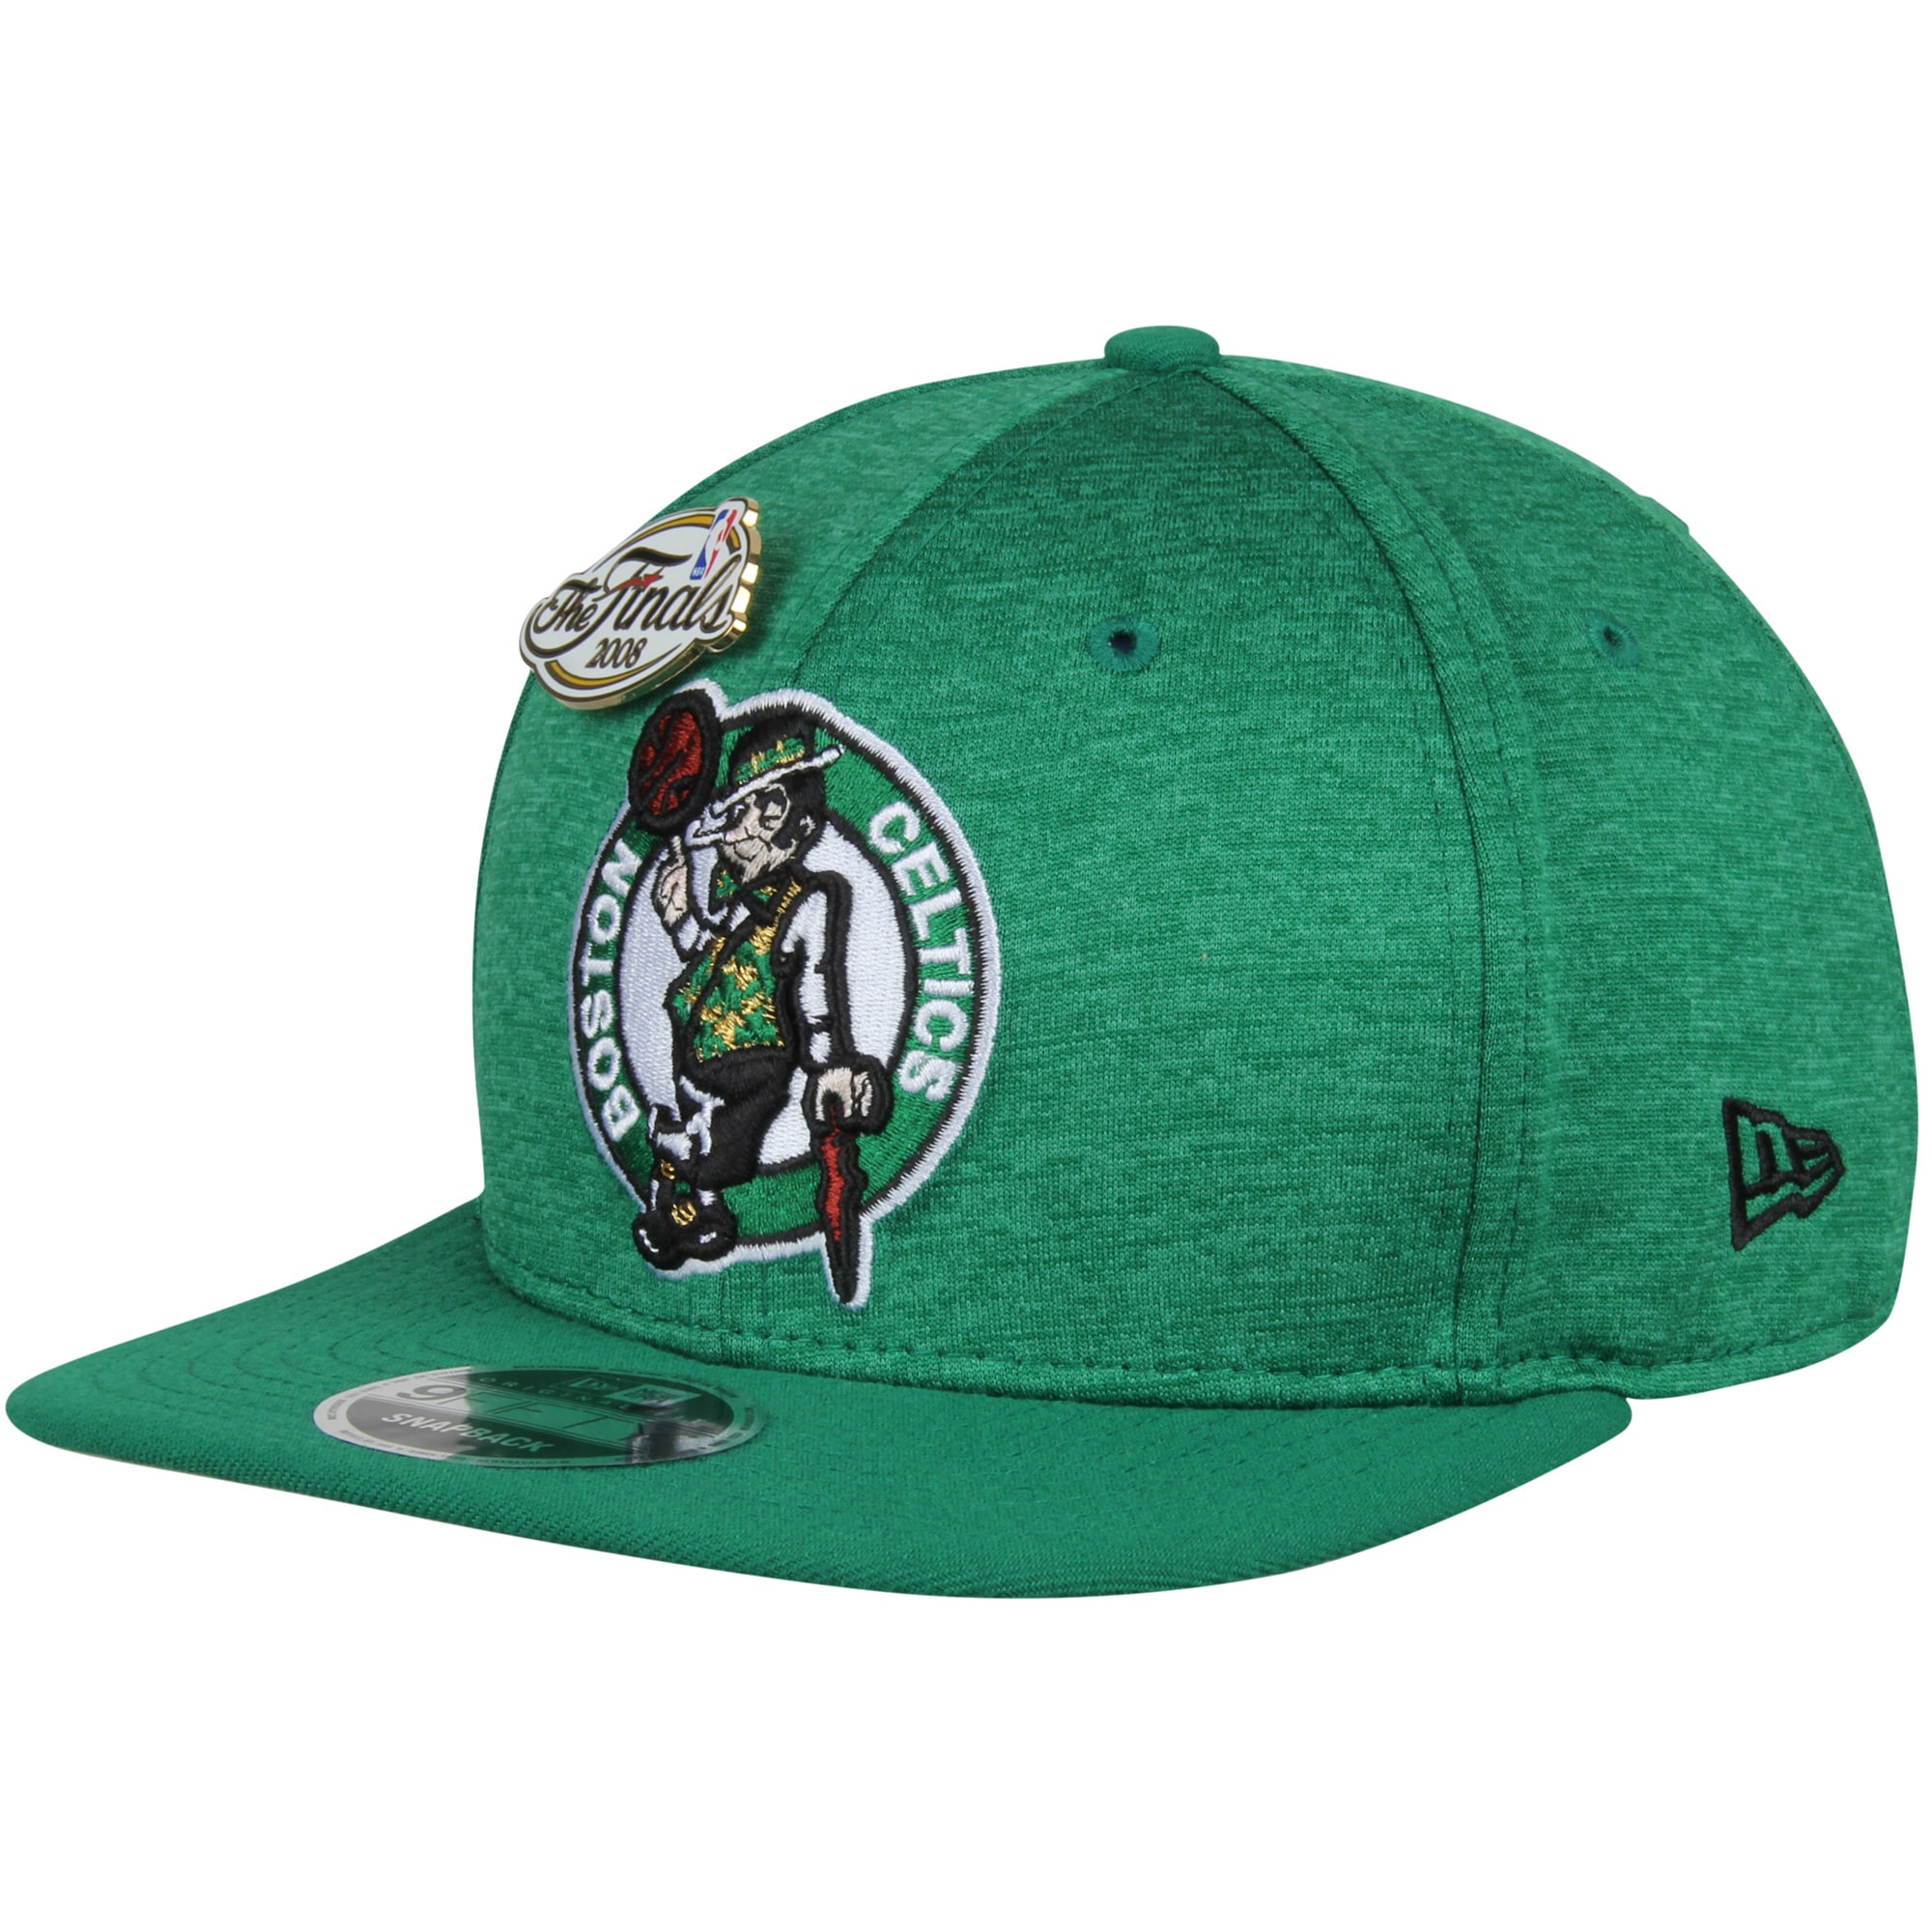 Boston Celtics New Era Pin Collection 9FIFTY Adjustable Snapback Hat - Heathered Kelly Green